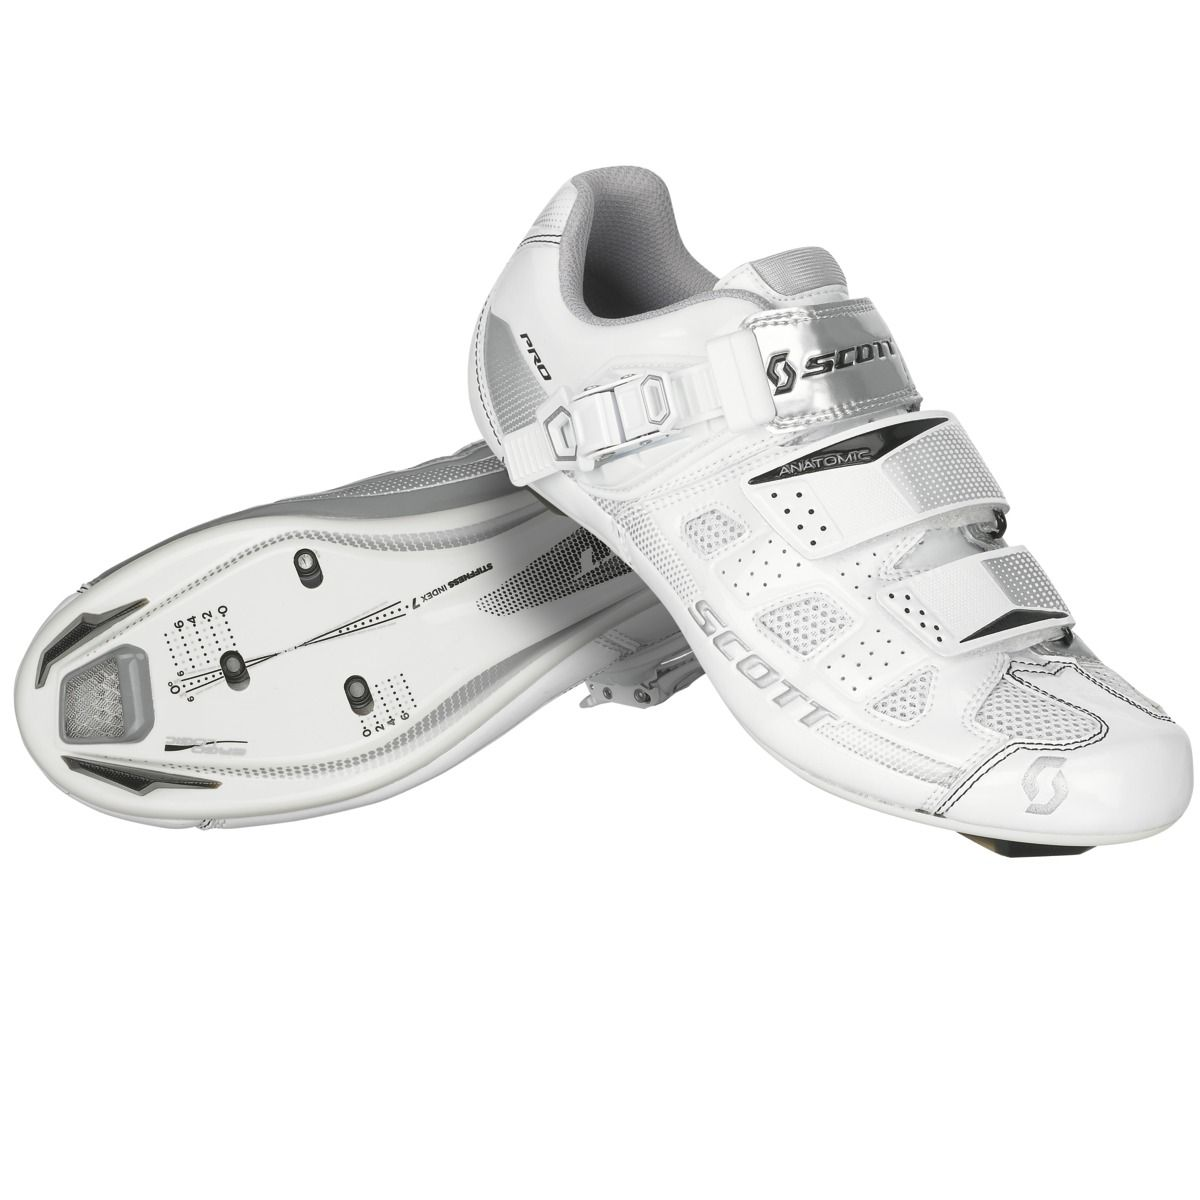 Shoe-Road-Pro-Lady-white-silver-gloss